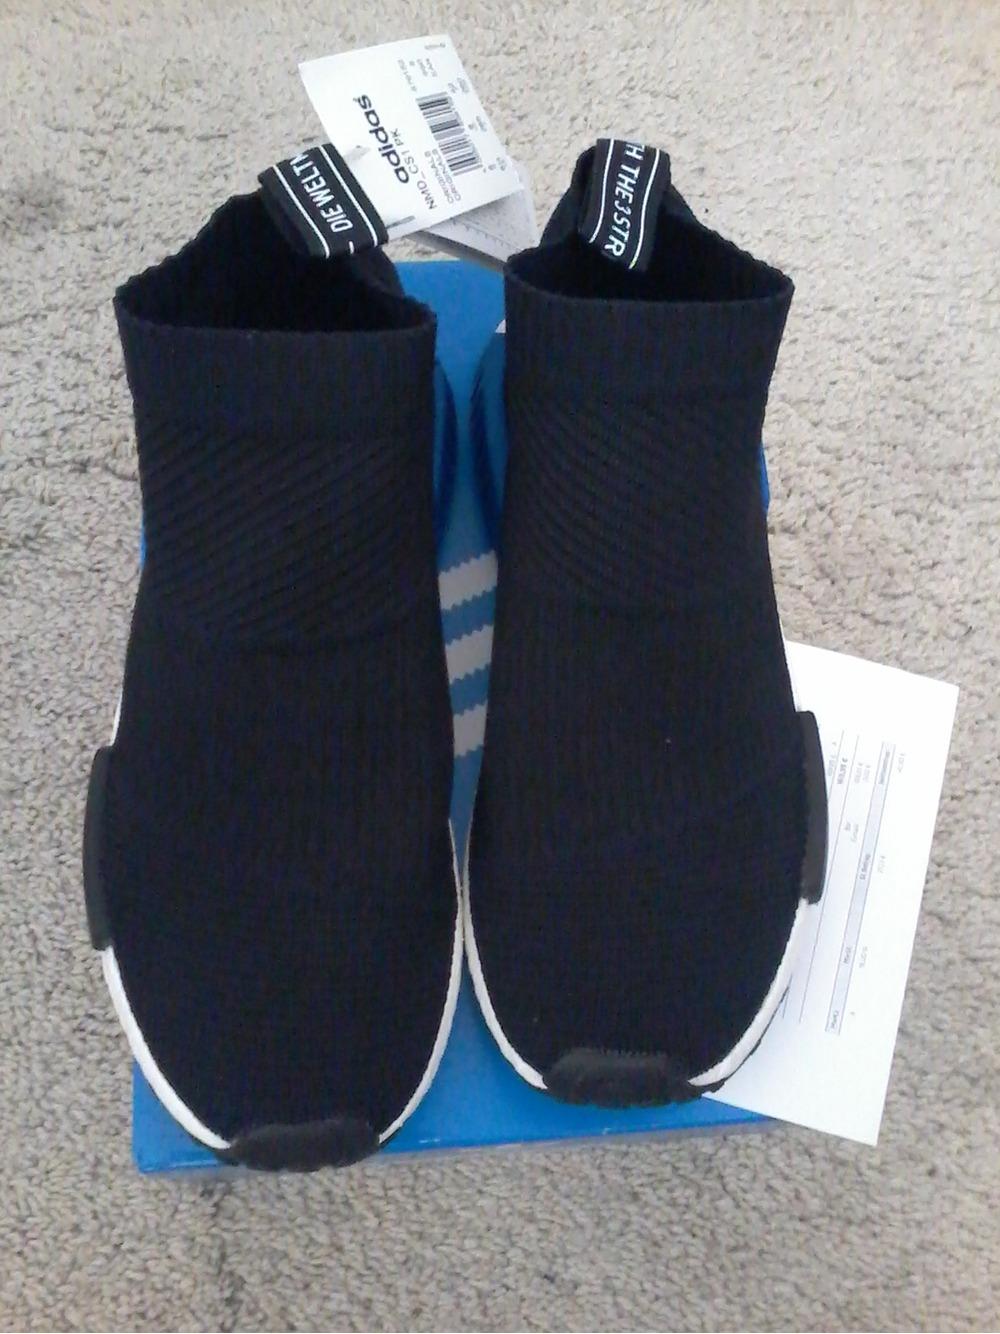 separation shoes b1c2c 5d4a4 Adidas NMD CS1 PK Winter Wool S32184 City Sock Black US 13